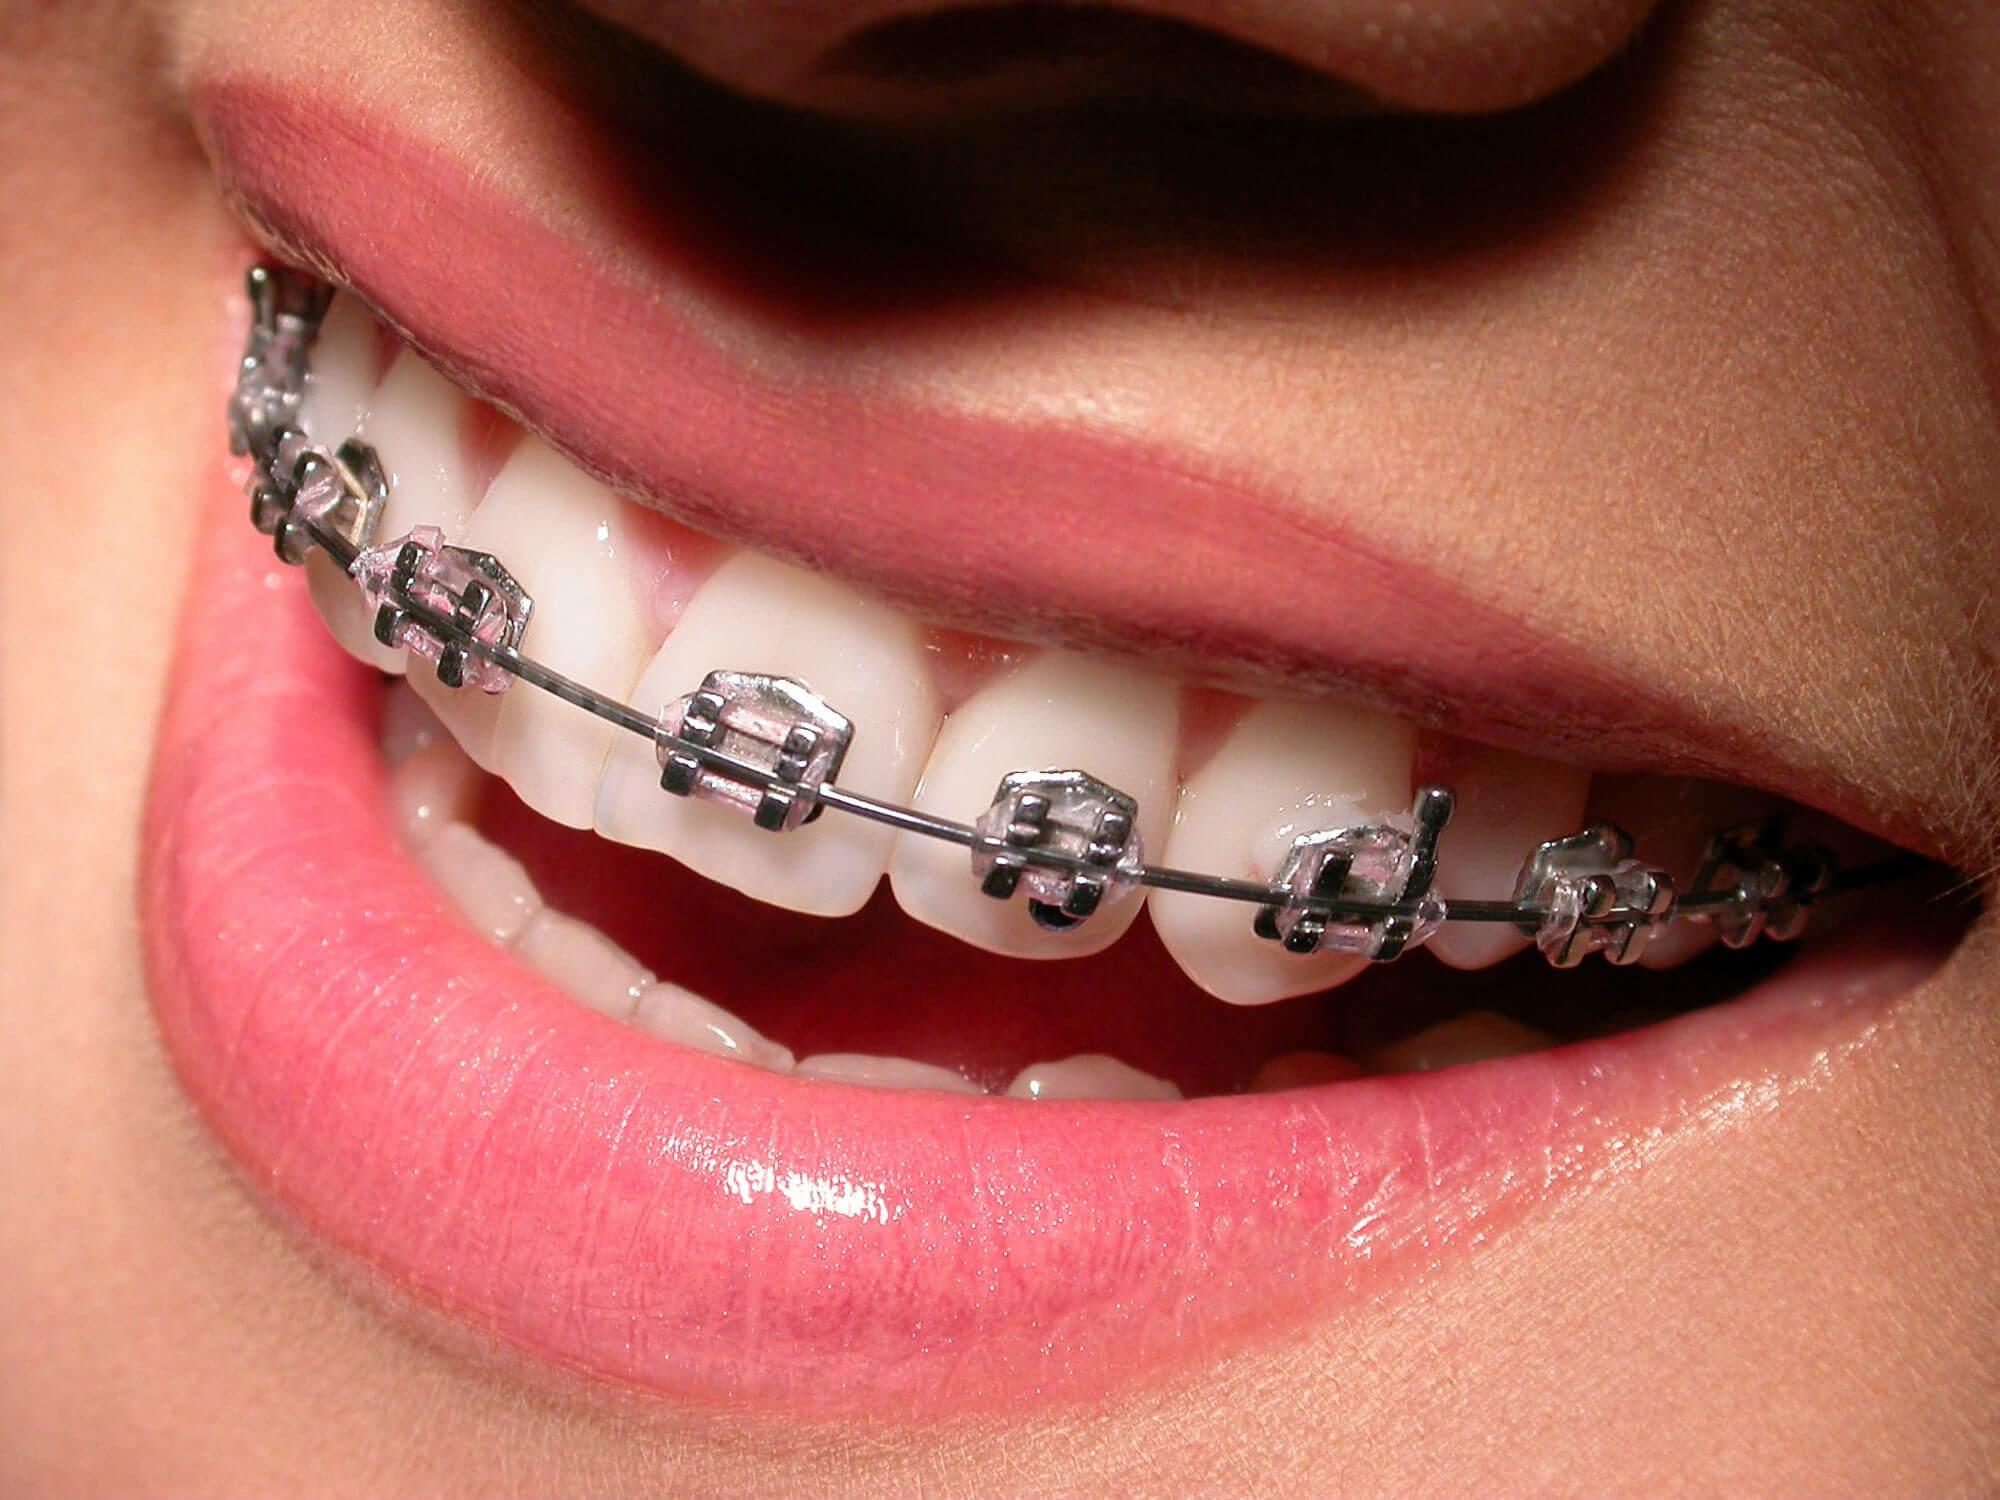 ortodontiya-1